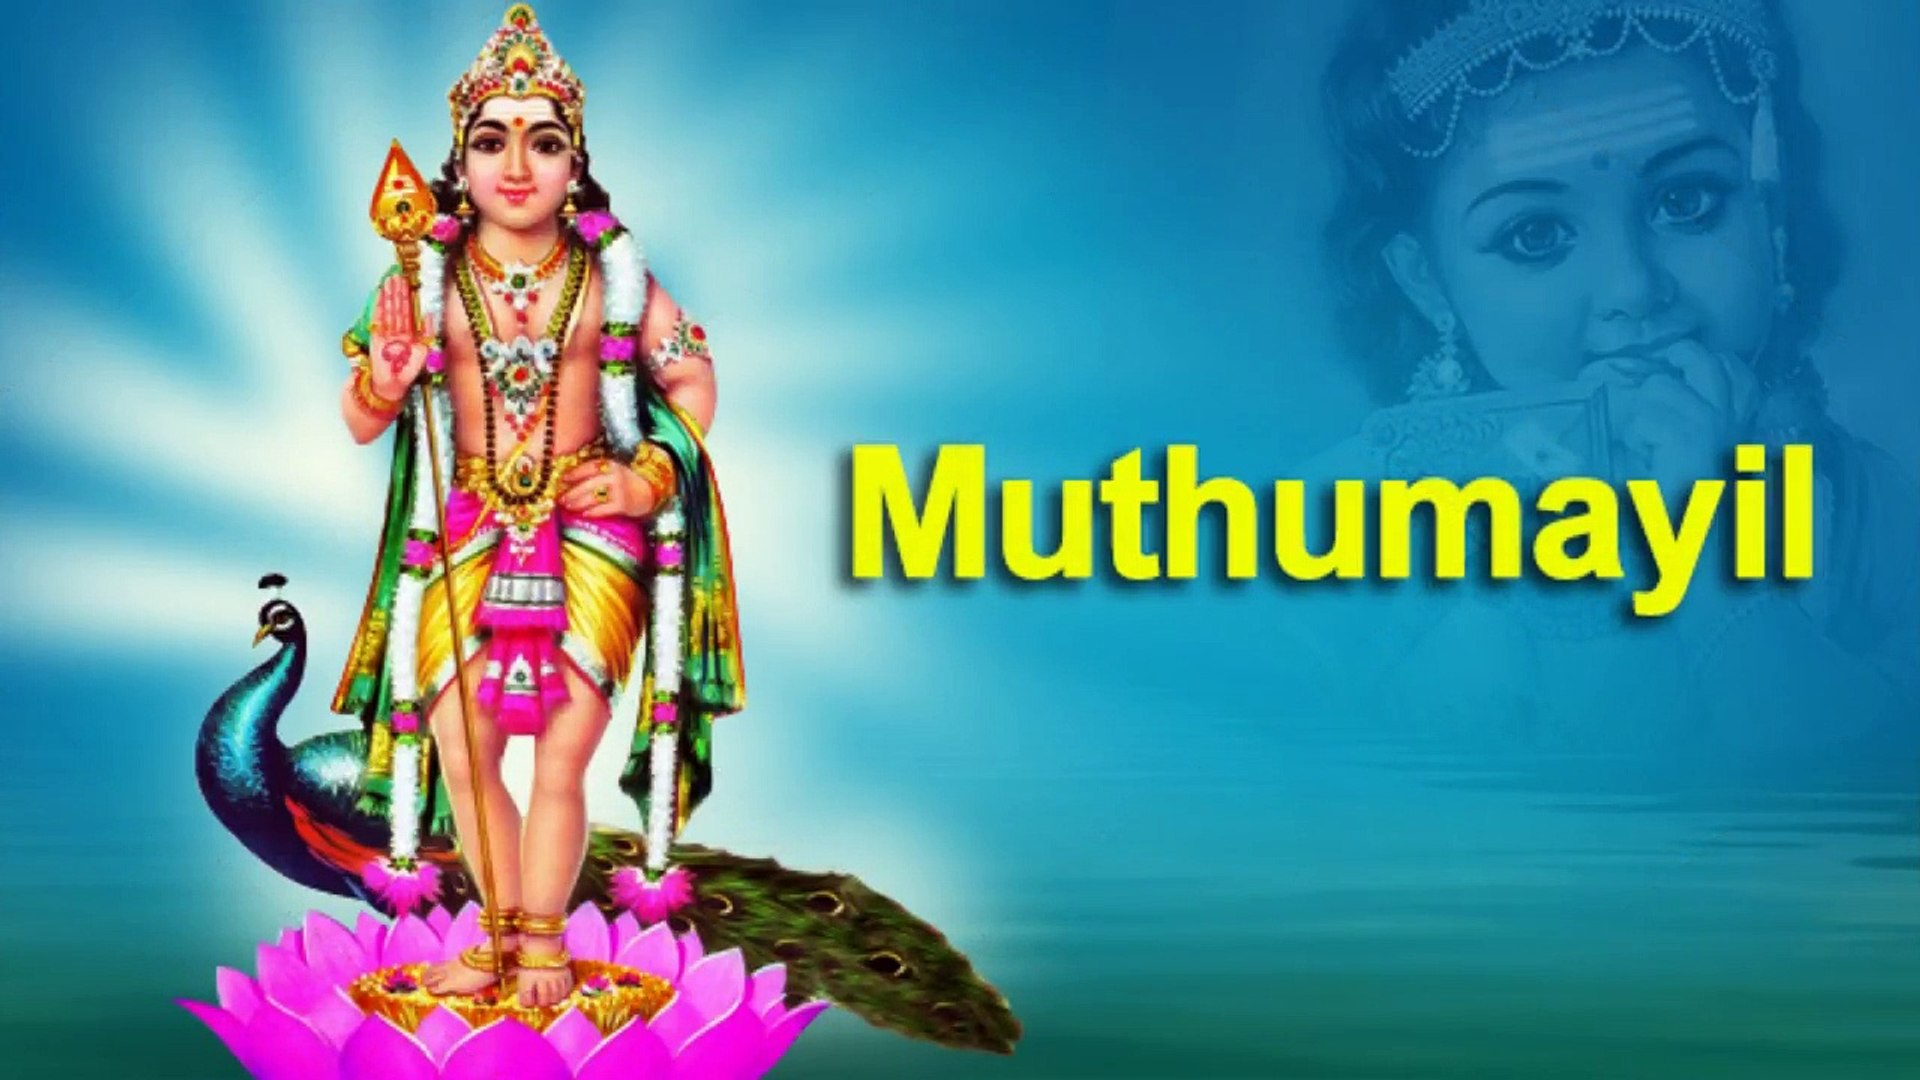 Muthumayil - Lord Murugan Tamil Devotional Songs ¦ Latest Tamil Devotional Songs